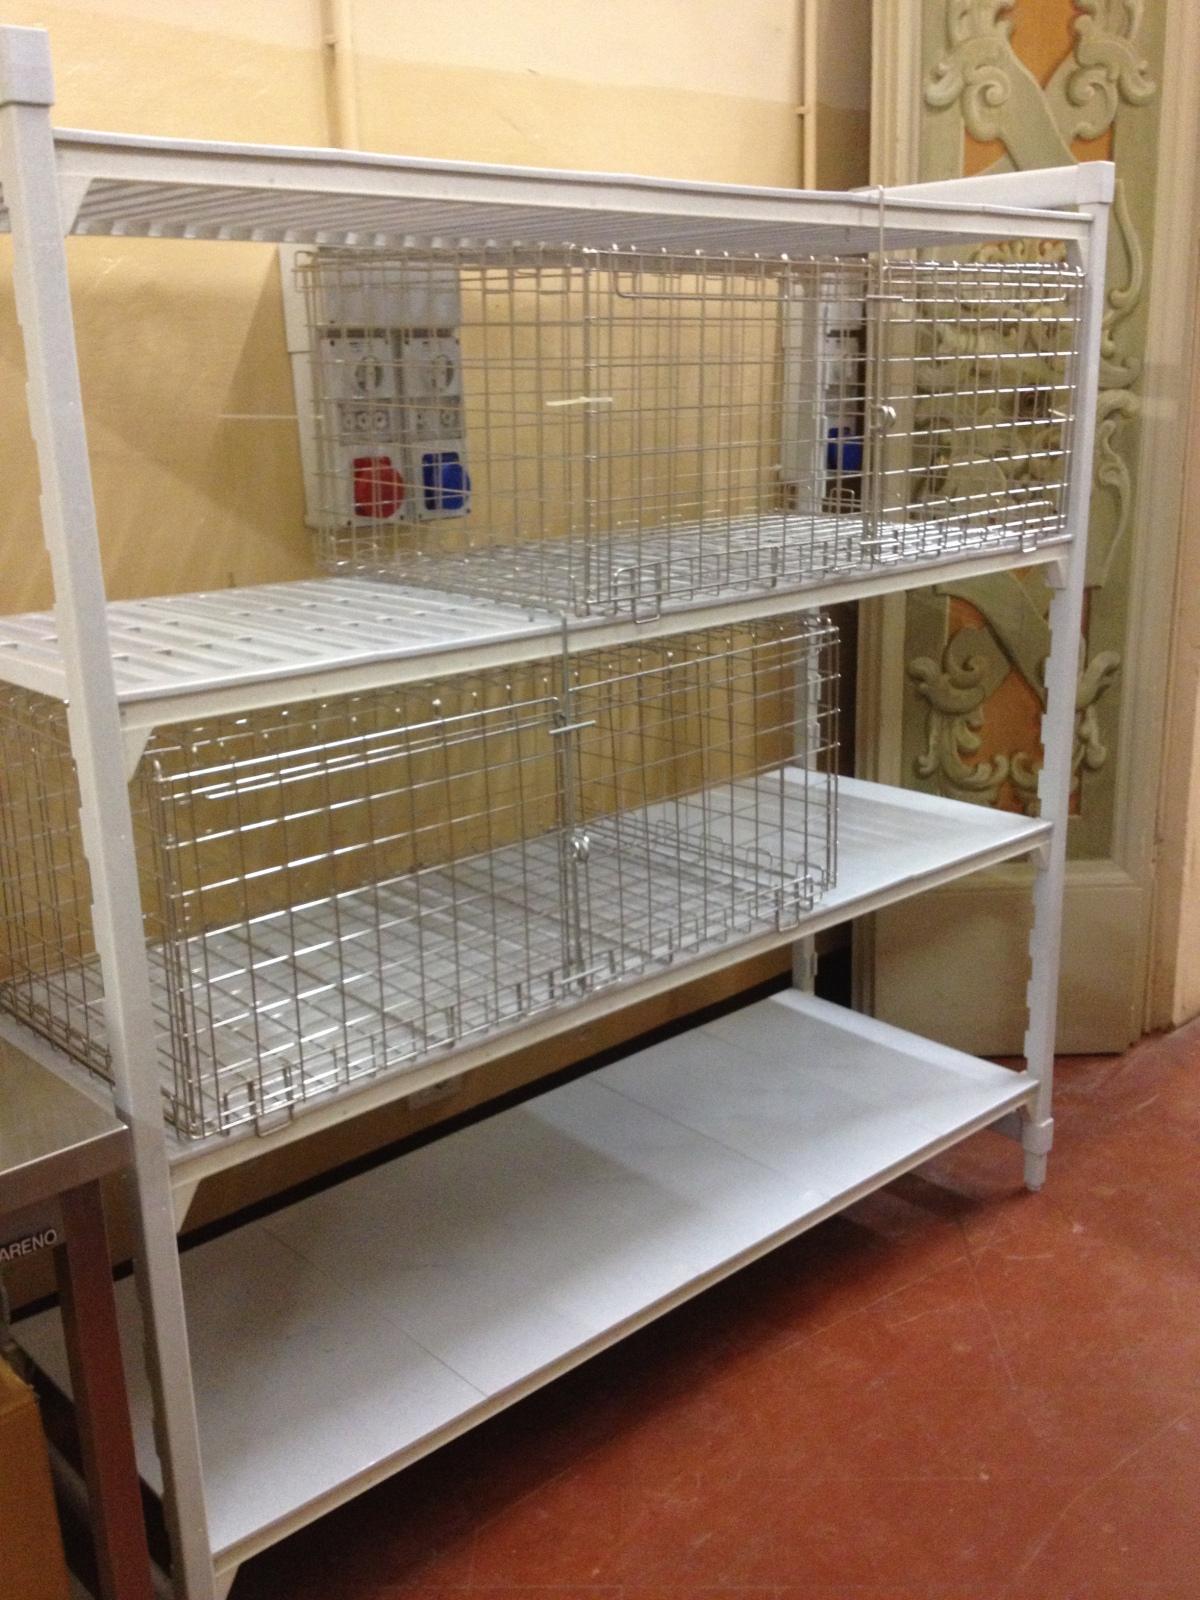 Cambro Camshelving Security Cage at Unaway Hotel - San Lazzaro Italy